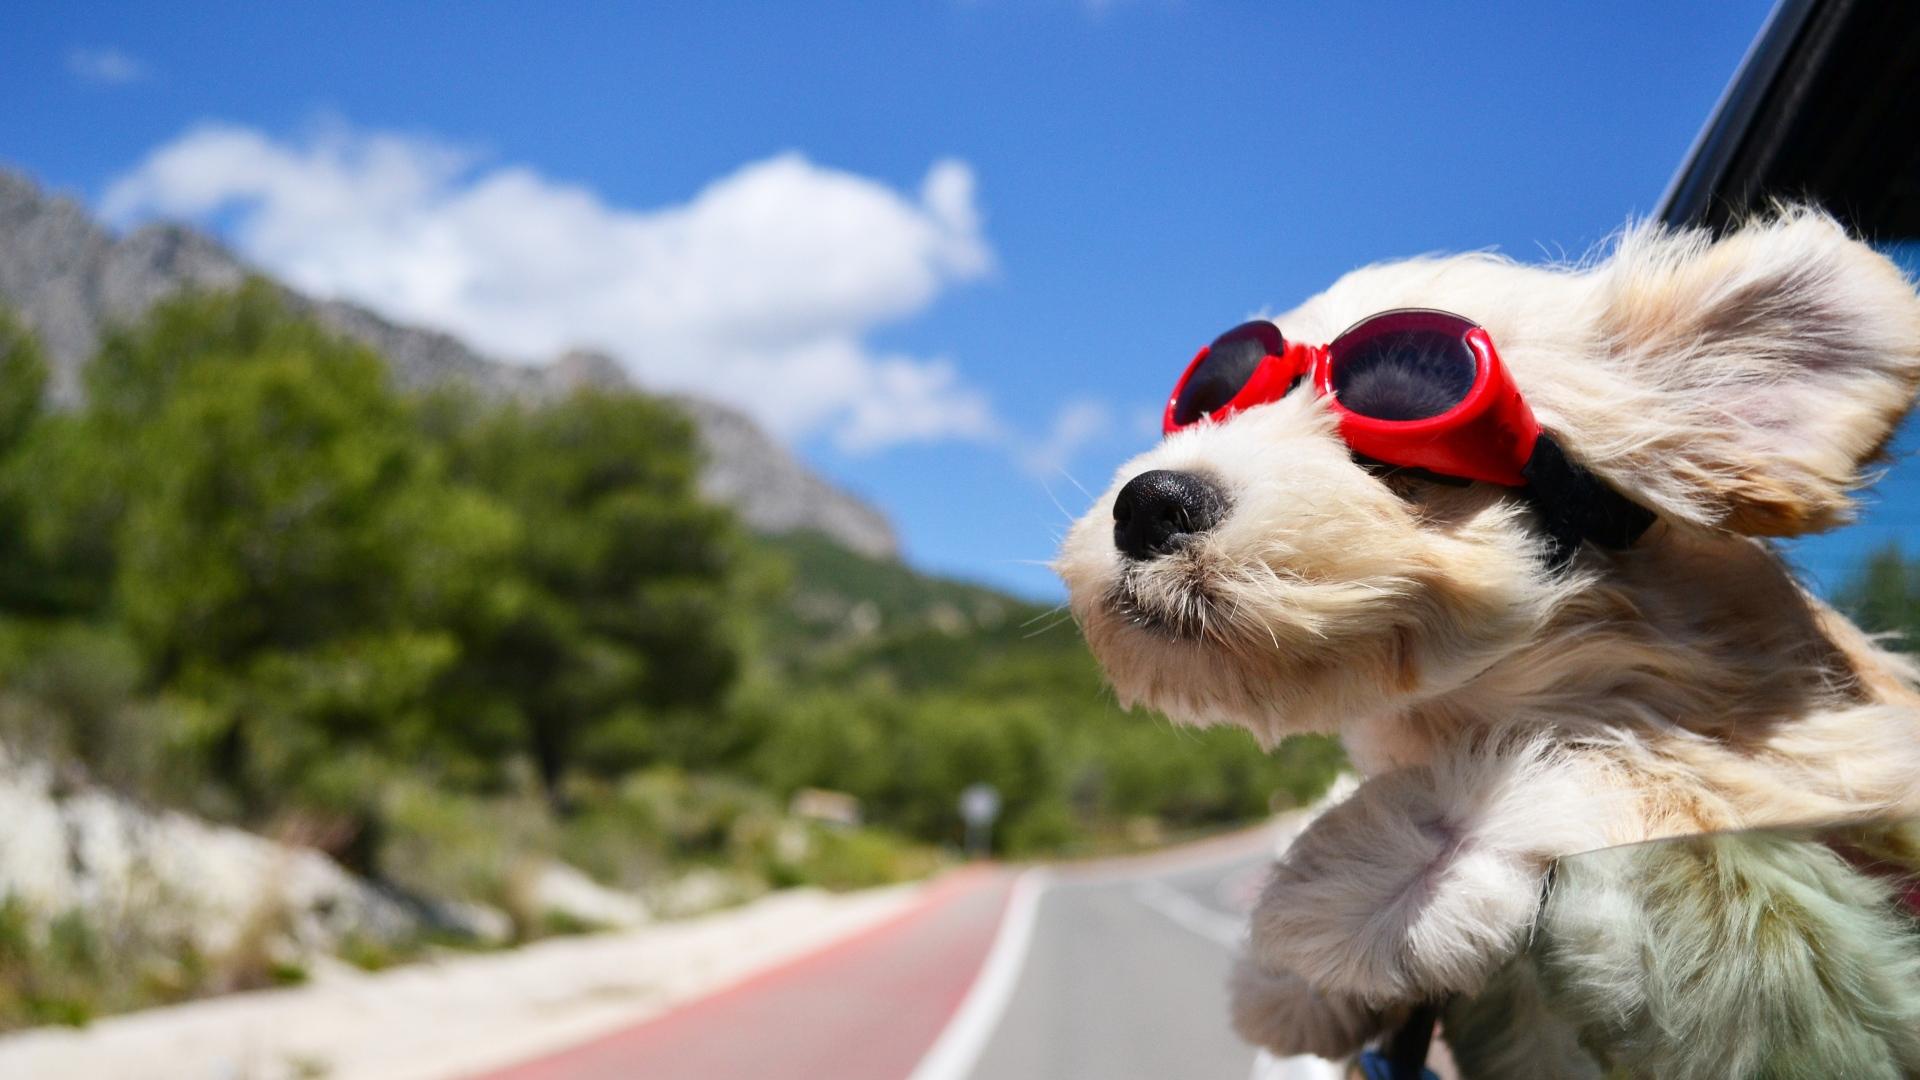 dog_face_wind_glasses_96452_1920x1080